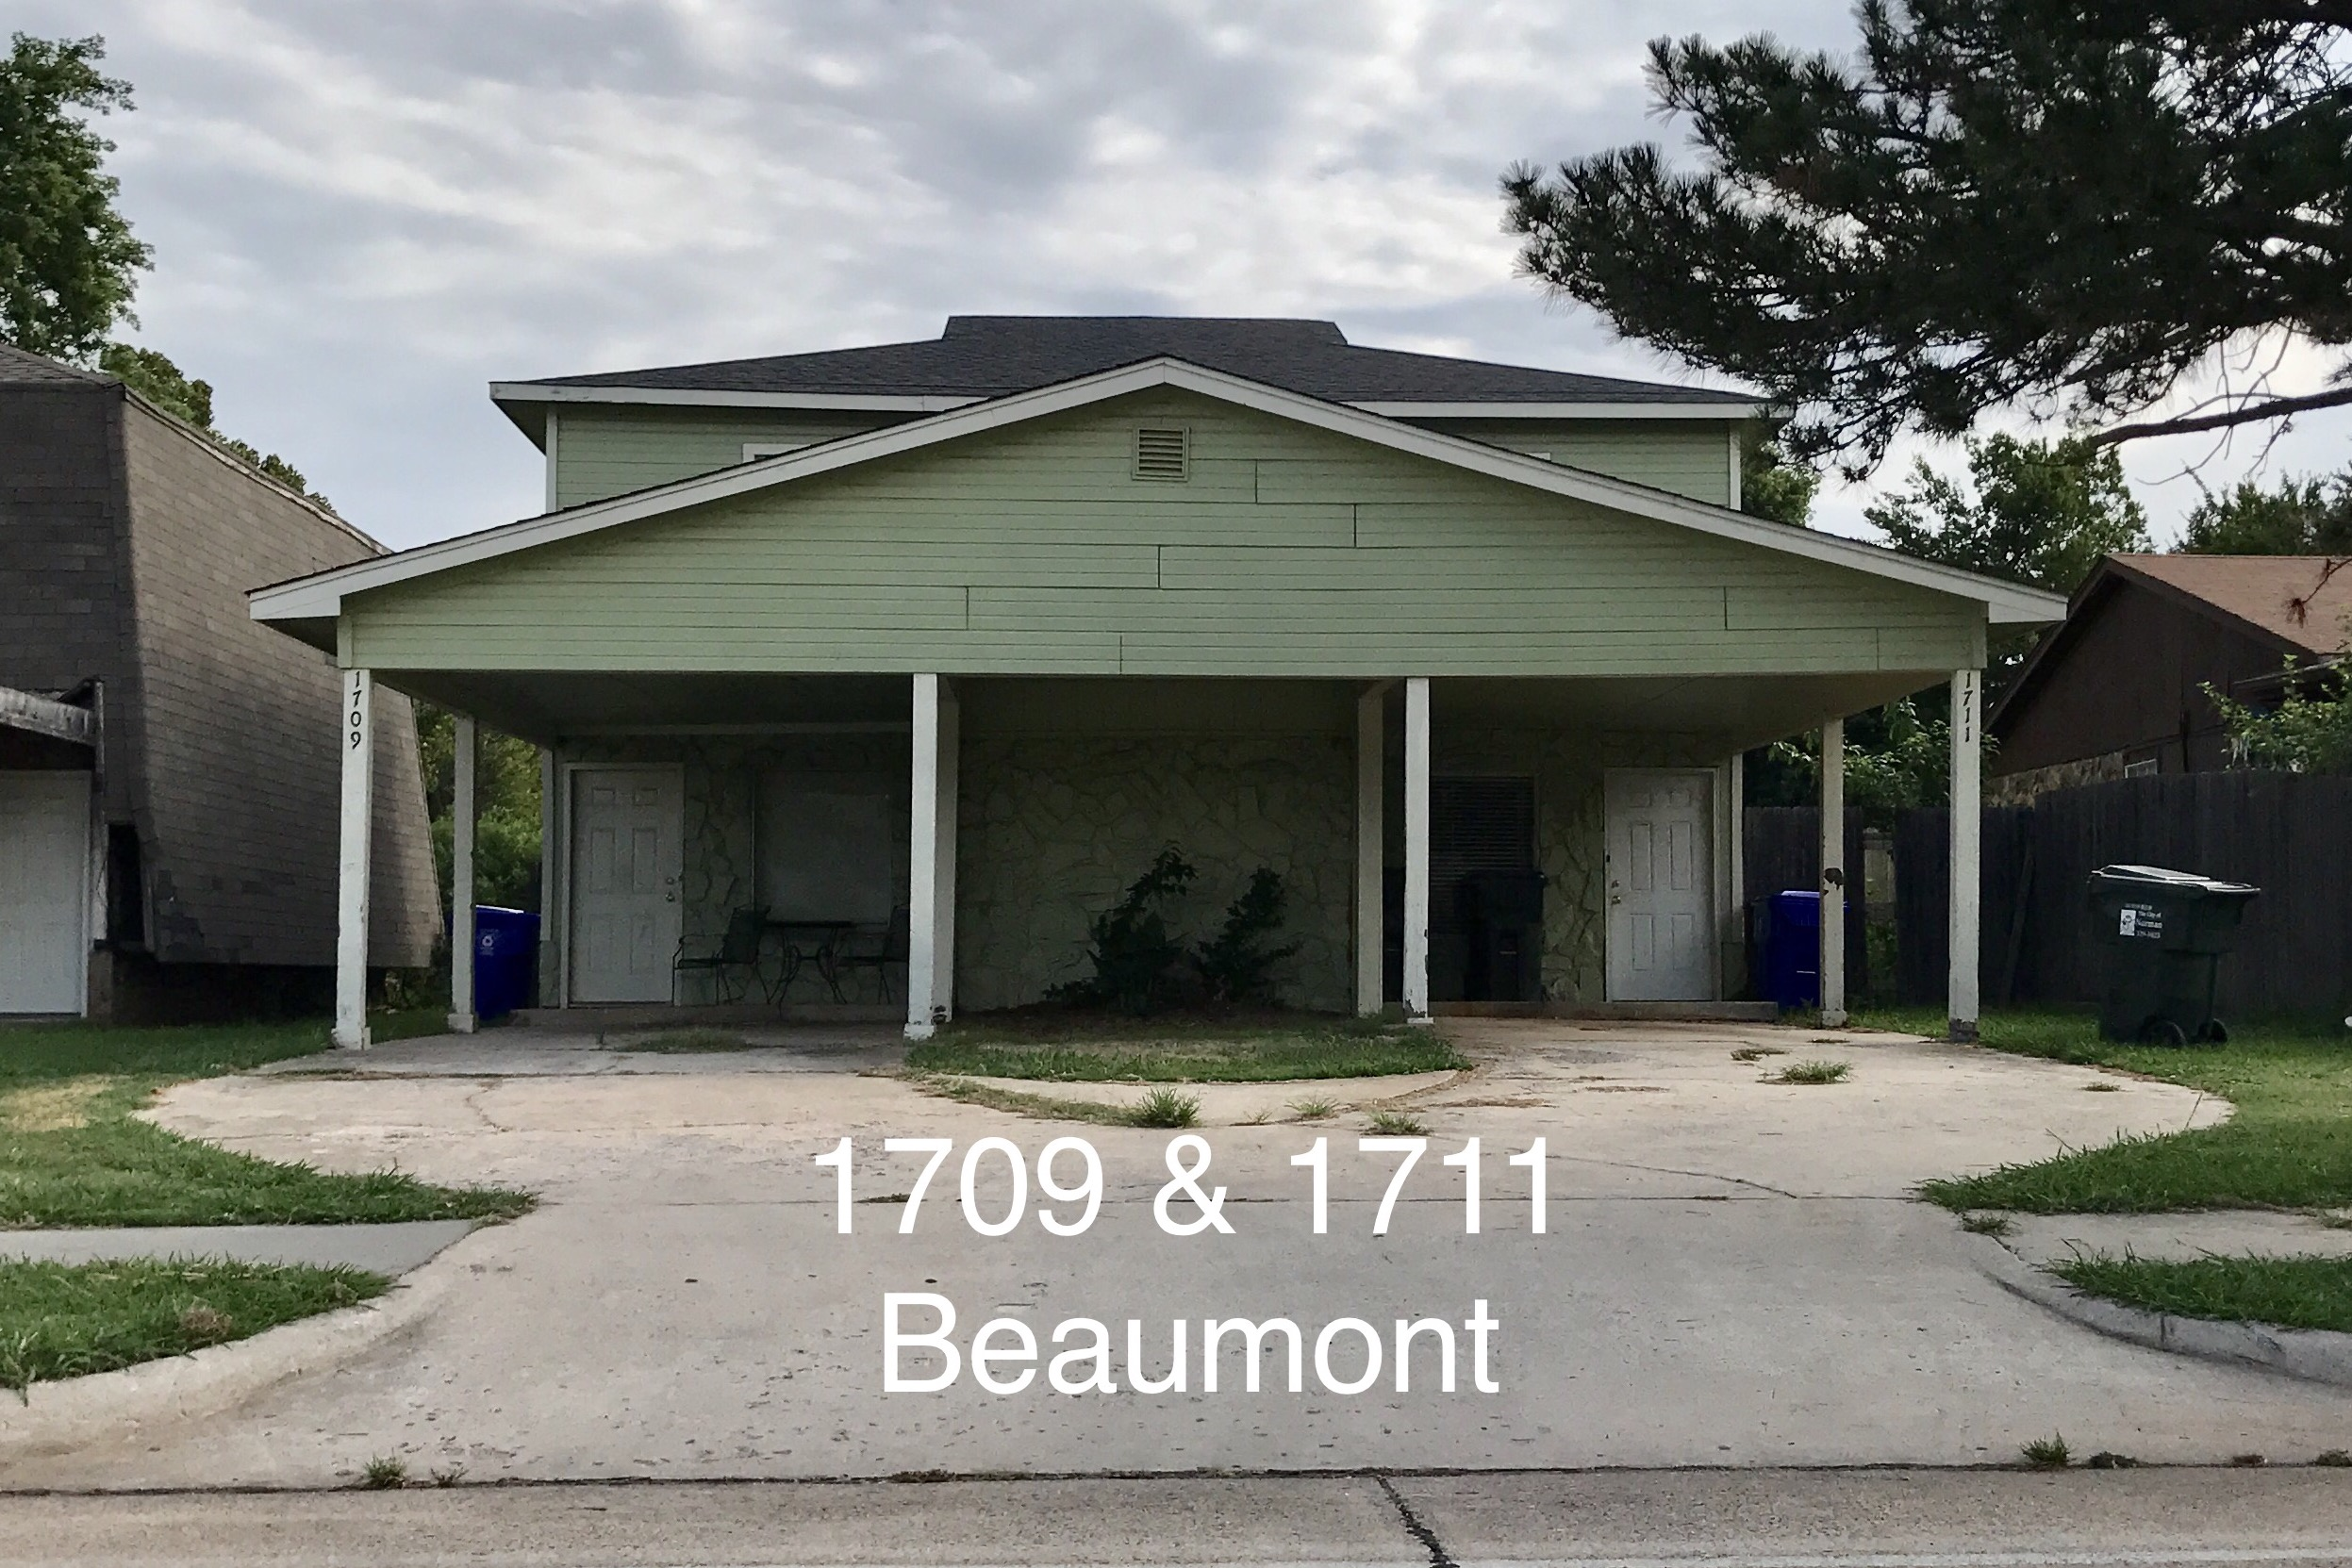 1709 & 1711 Beaumont.jpg